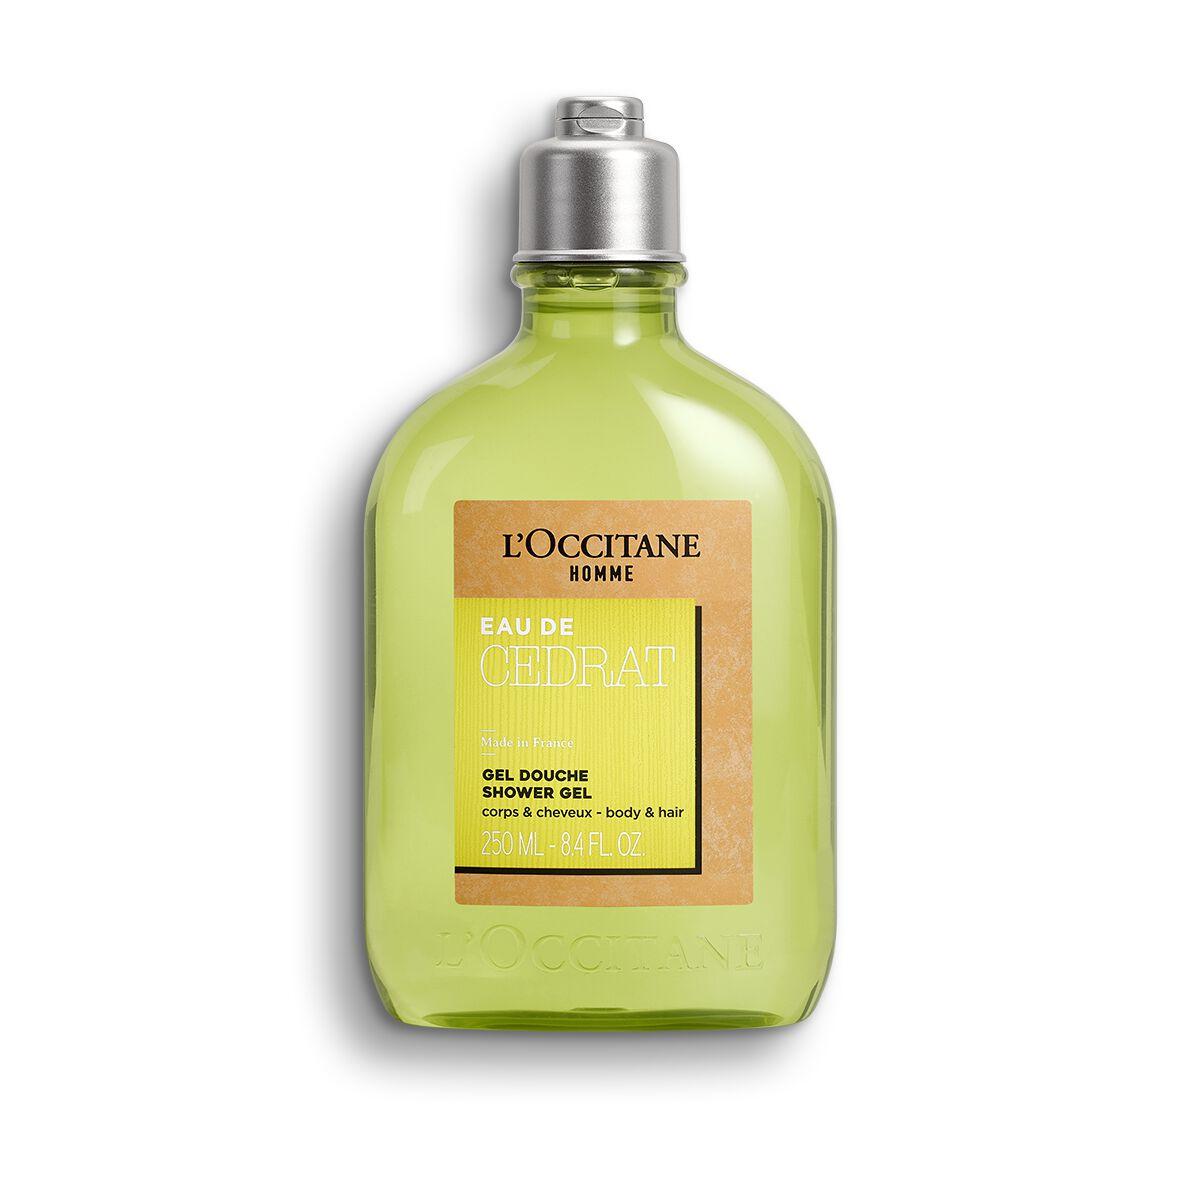 Eau de Cédrat Shower Gel 250 ml.